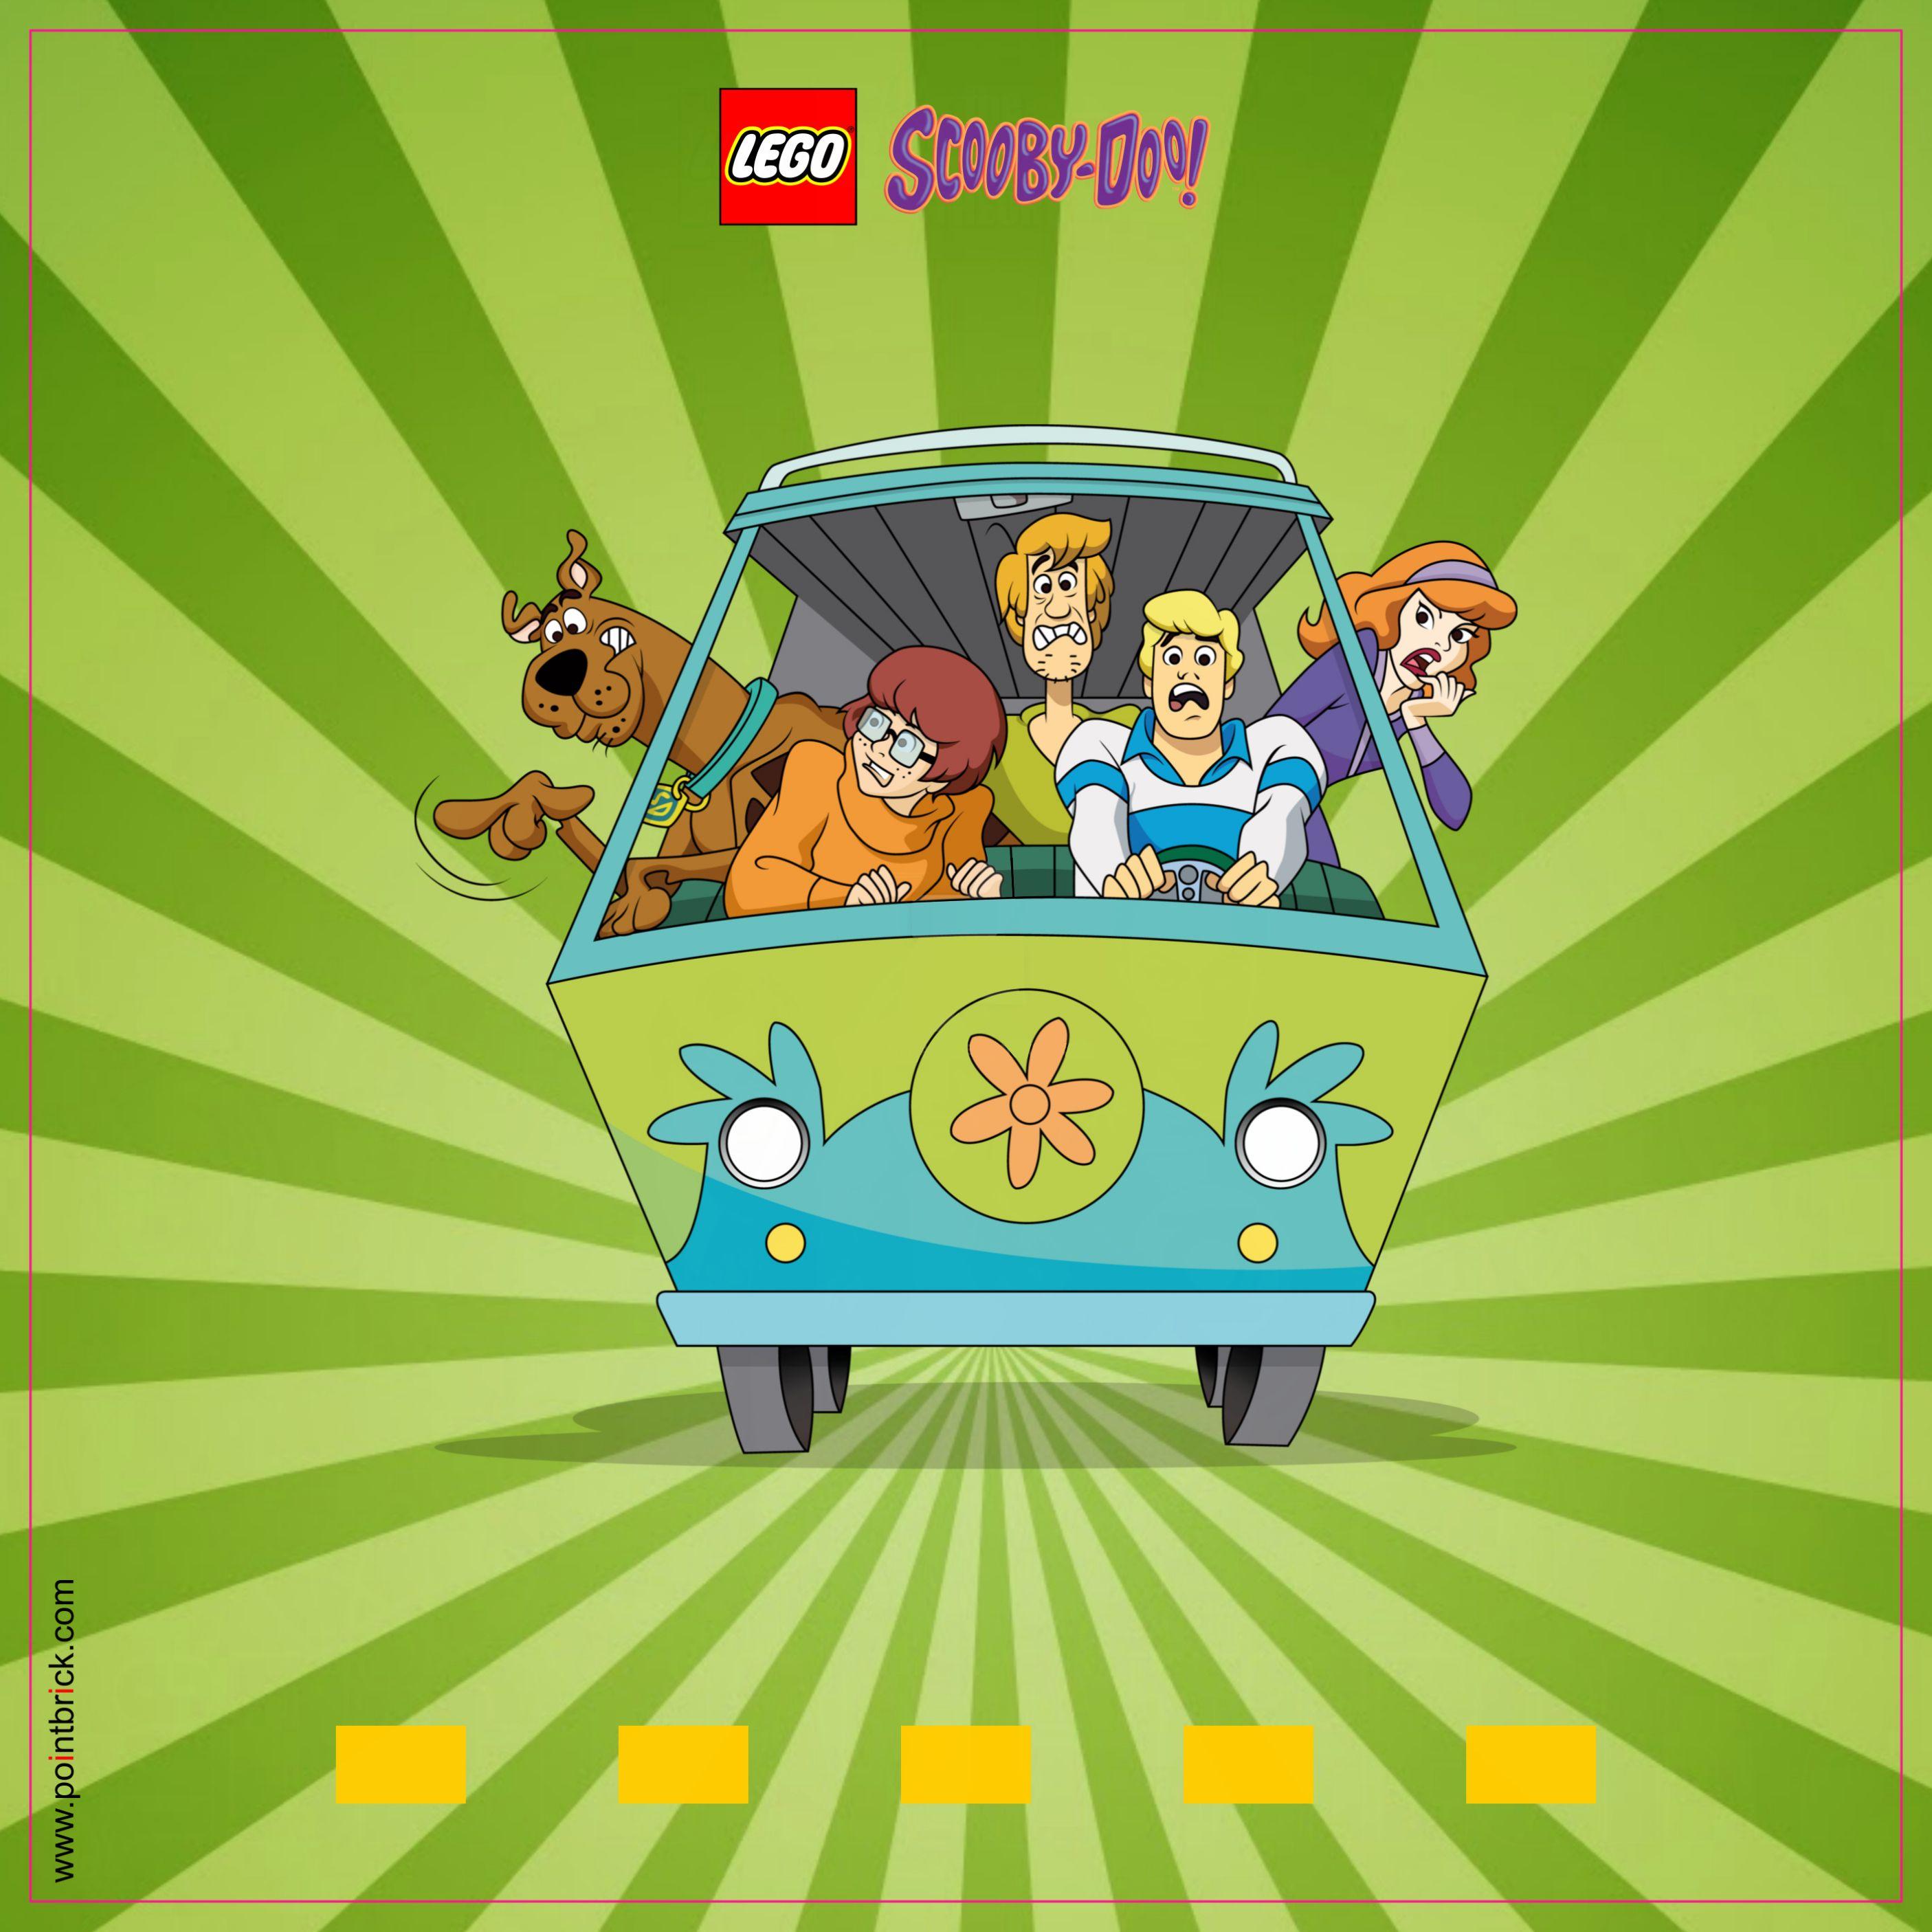 LEGO Minifigures Display Frame: Sfondi Scooby Doo | Pinterest